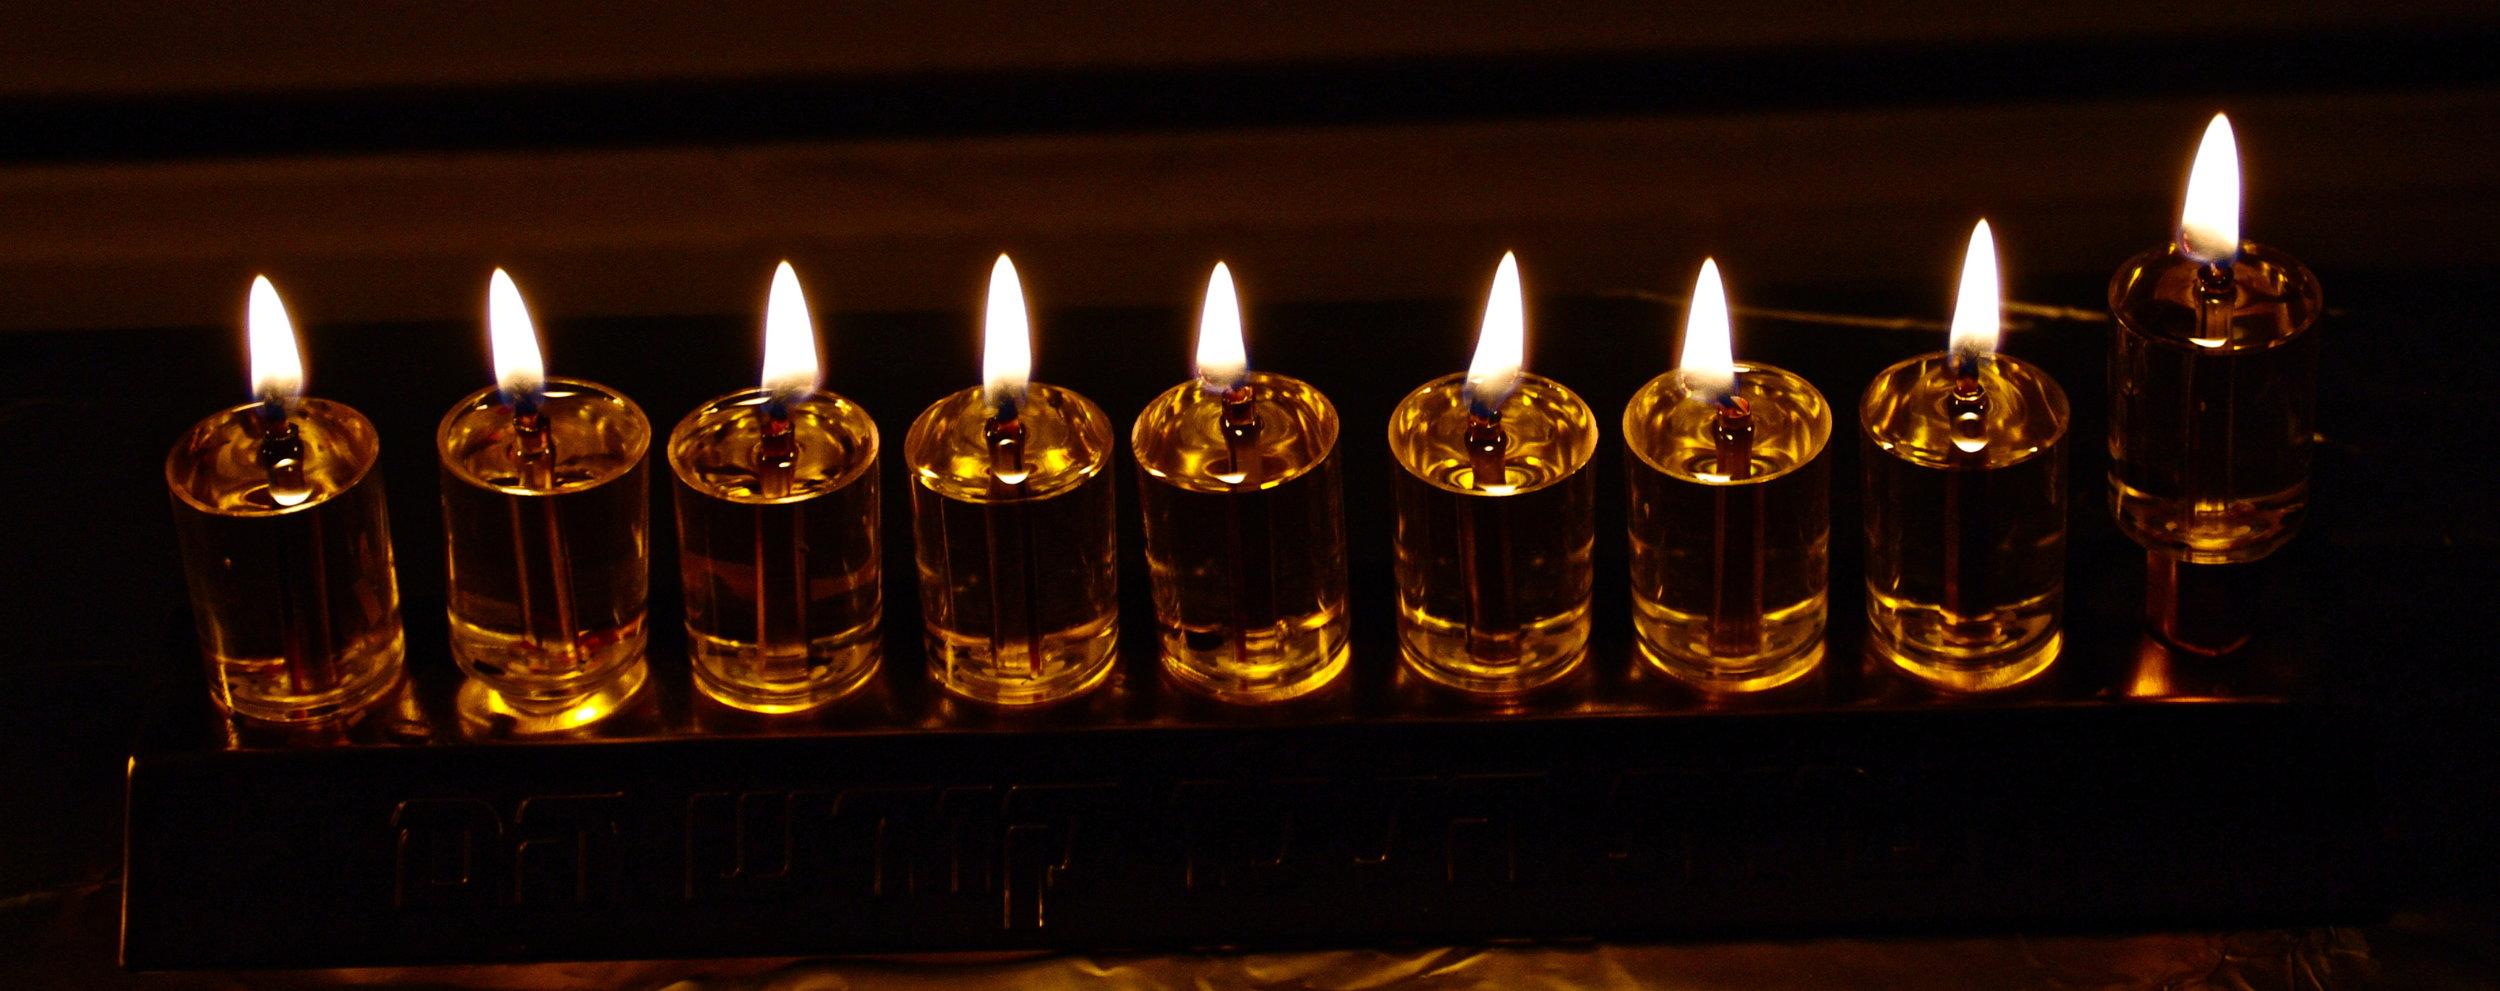 Shabbat Chanukah @ PJC - December 8   Join us for a spirited & spiritual Shabbat Morning Chanukah Hallel & Tefilah followed by a celebratory Kiddush